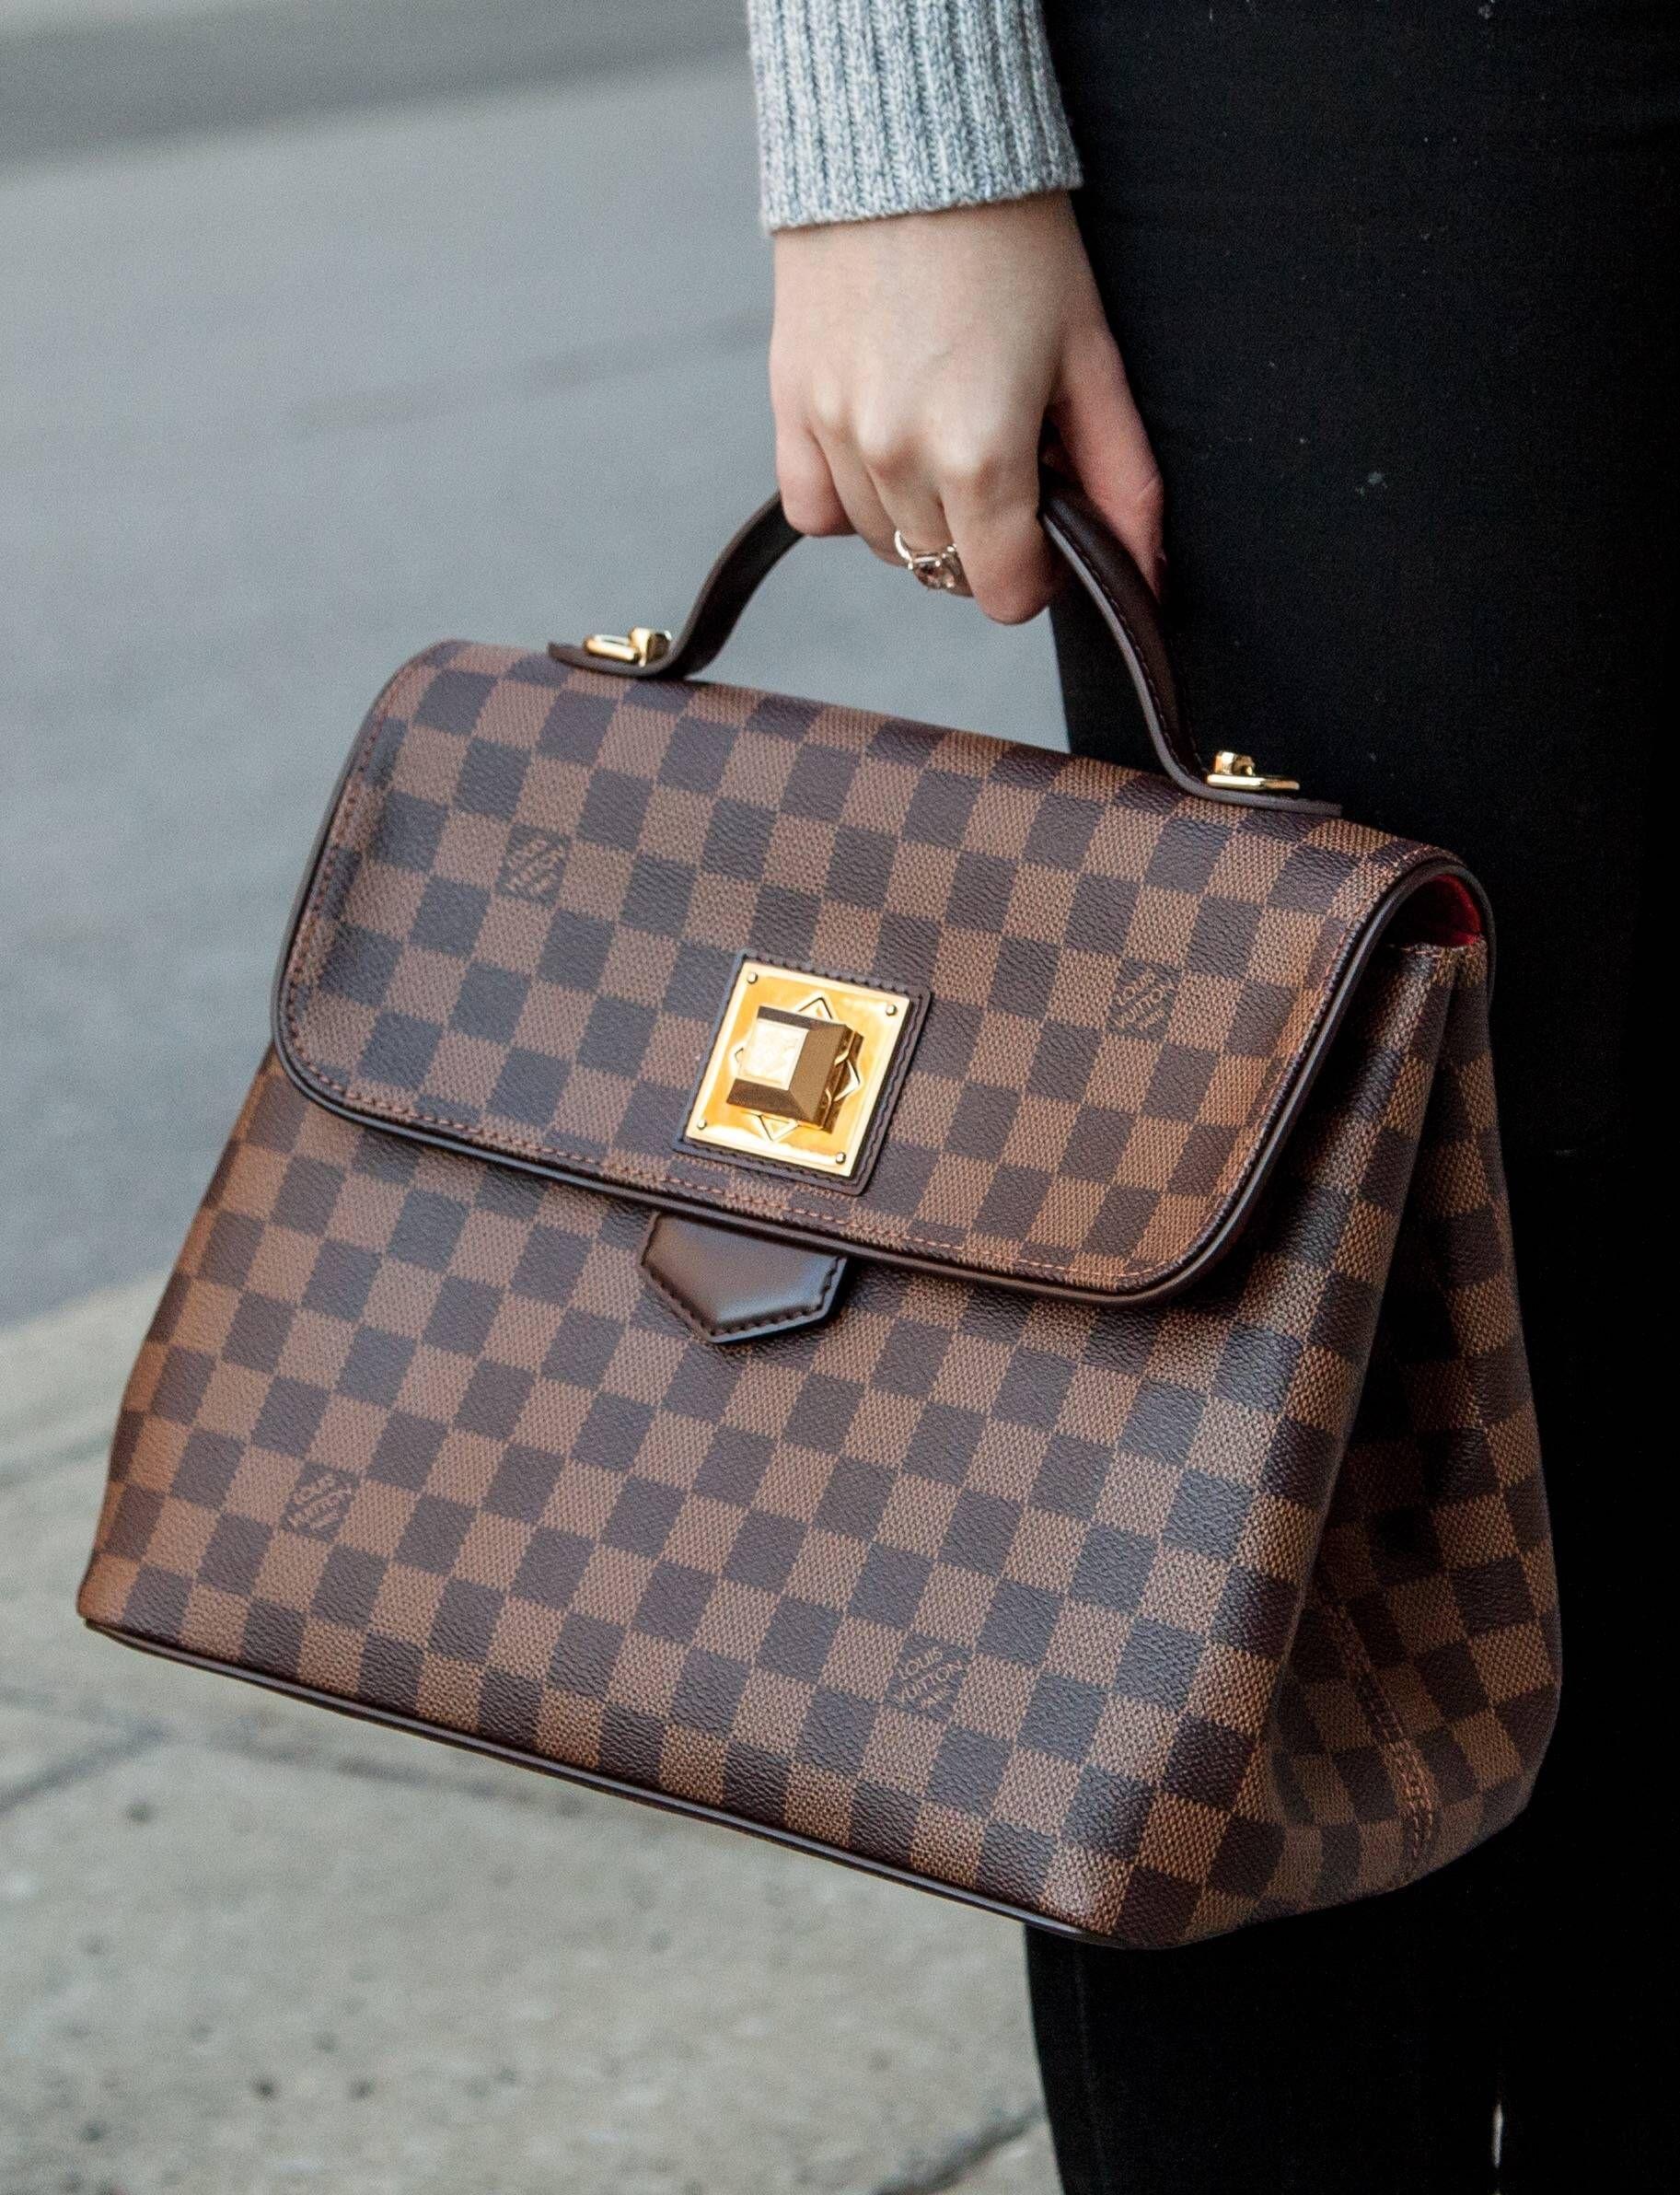 Louis Vuitton Bergamo Bag A Beautiful Pre Owned Designer Handbag